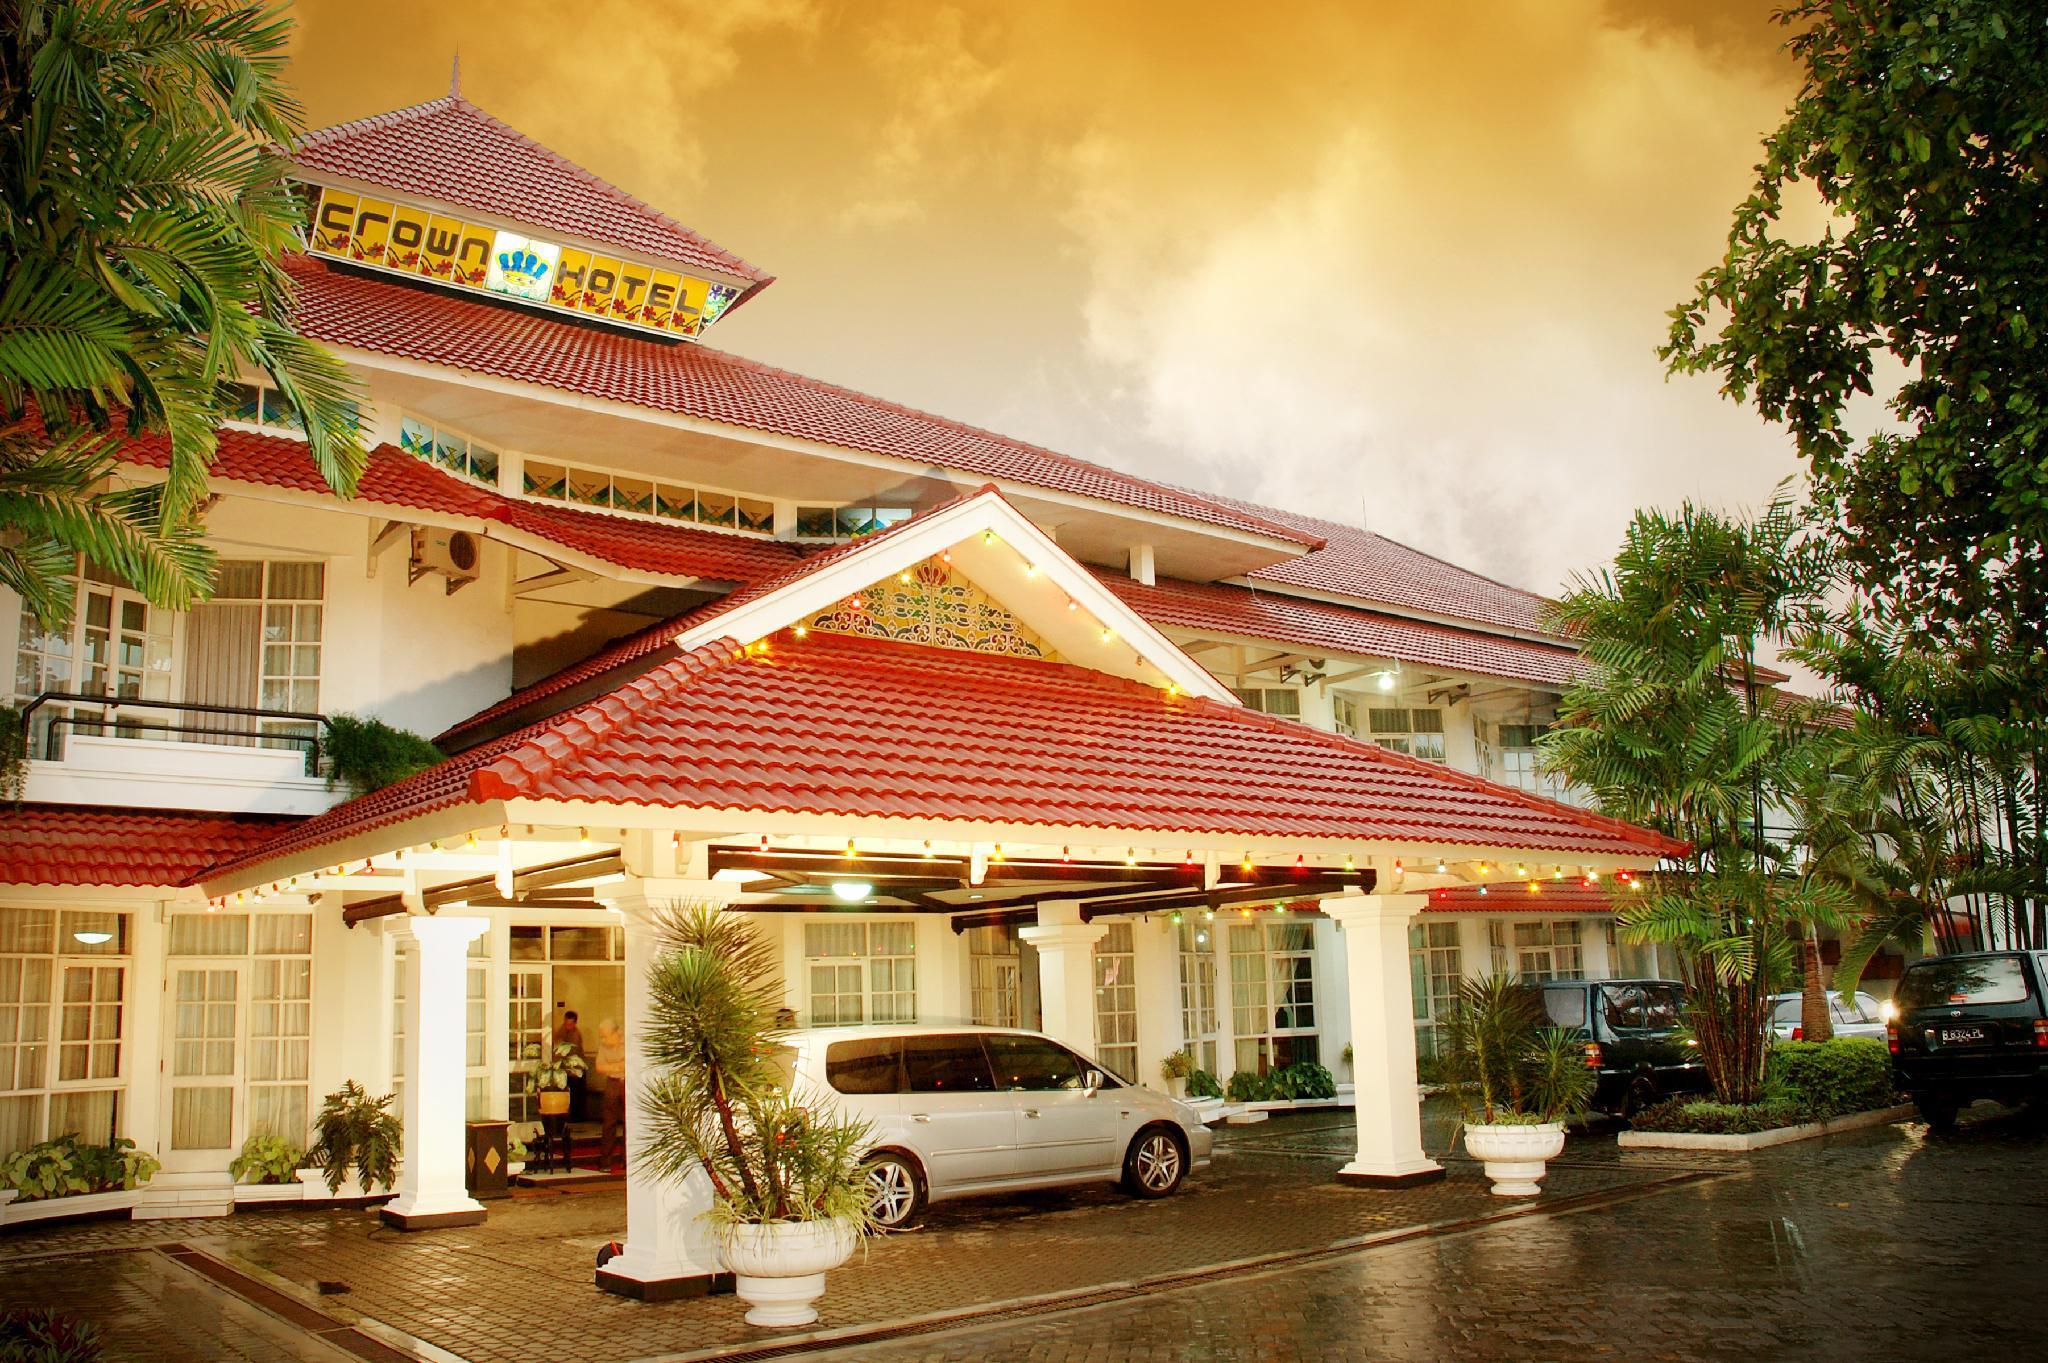 Crown Hotel Tasikmalaya, Tasikmalaya